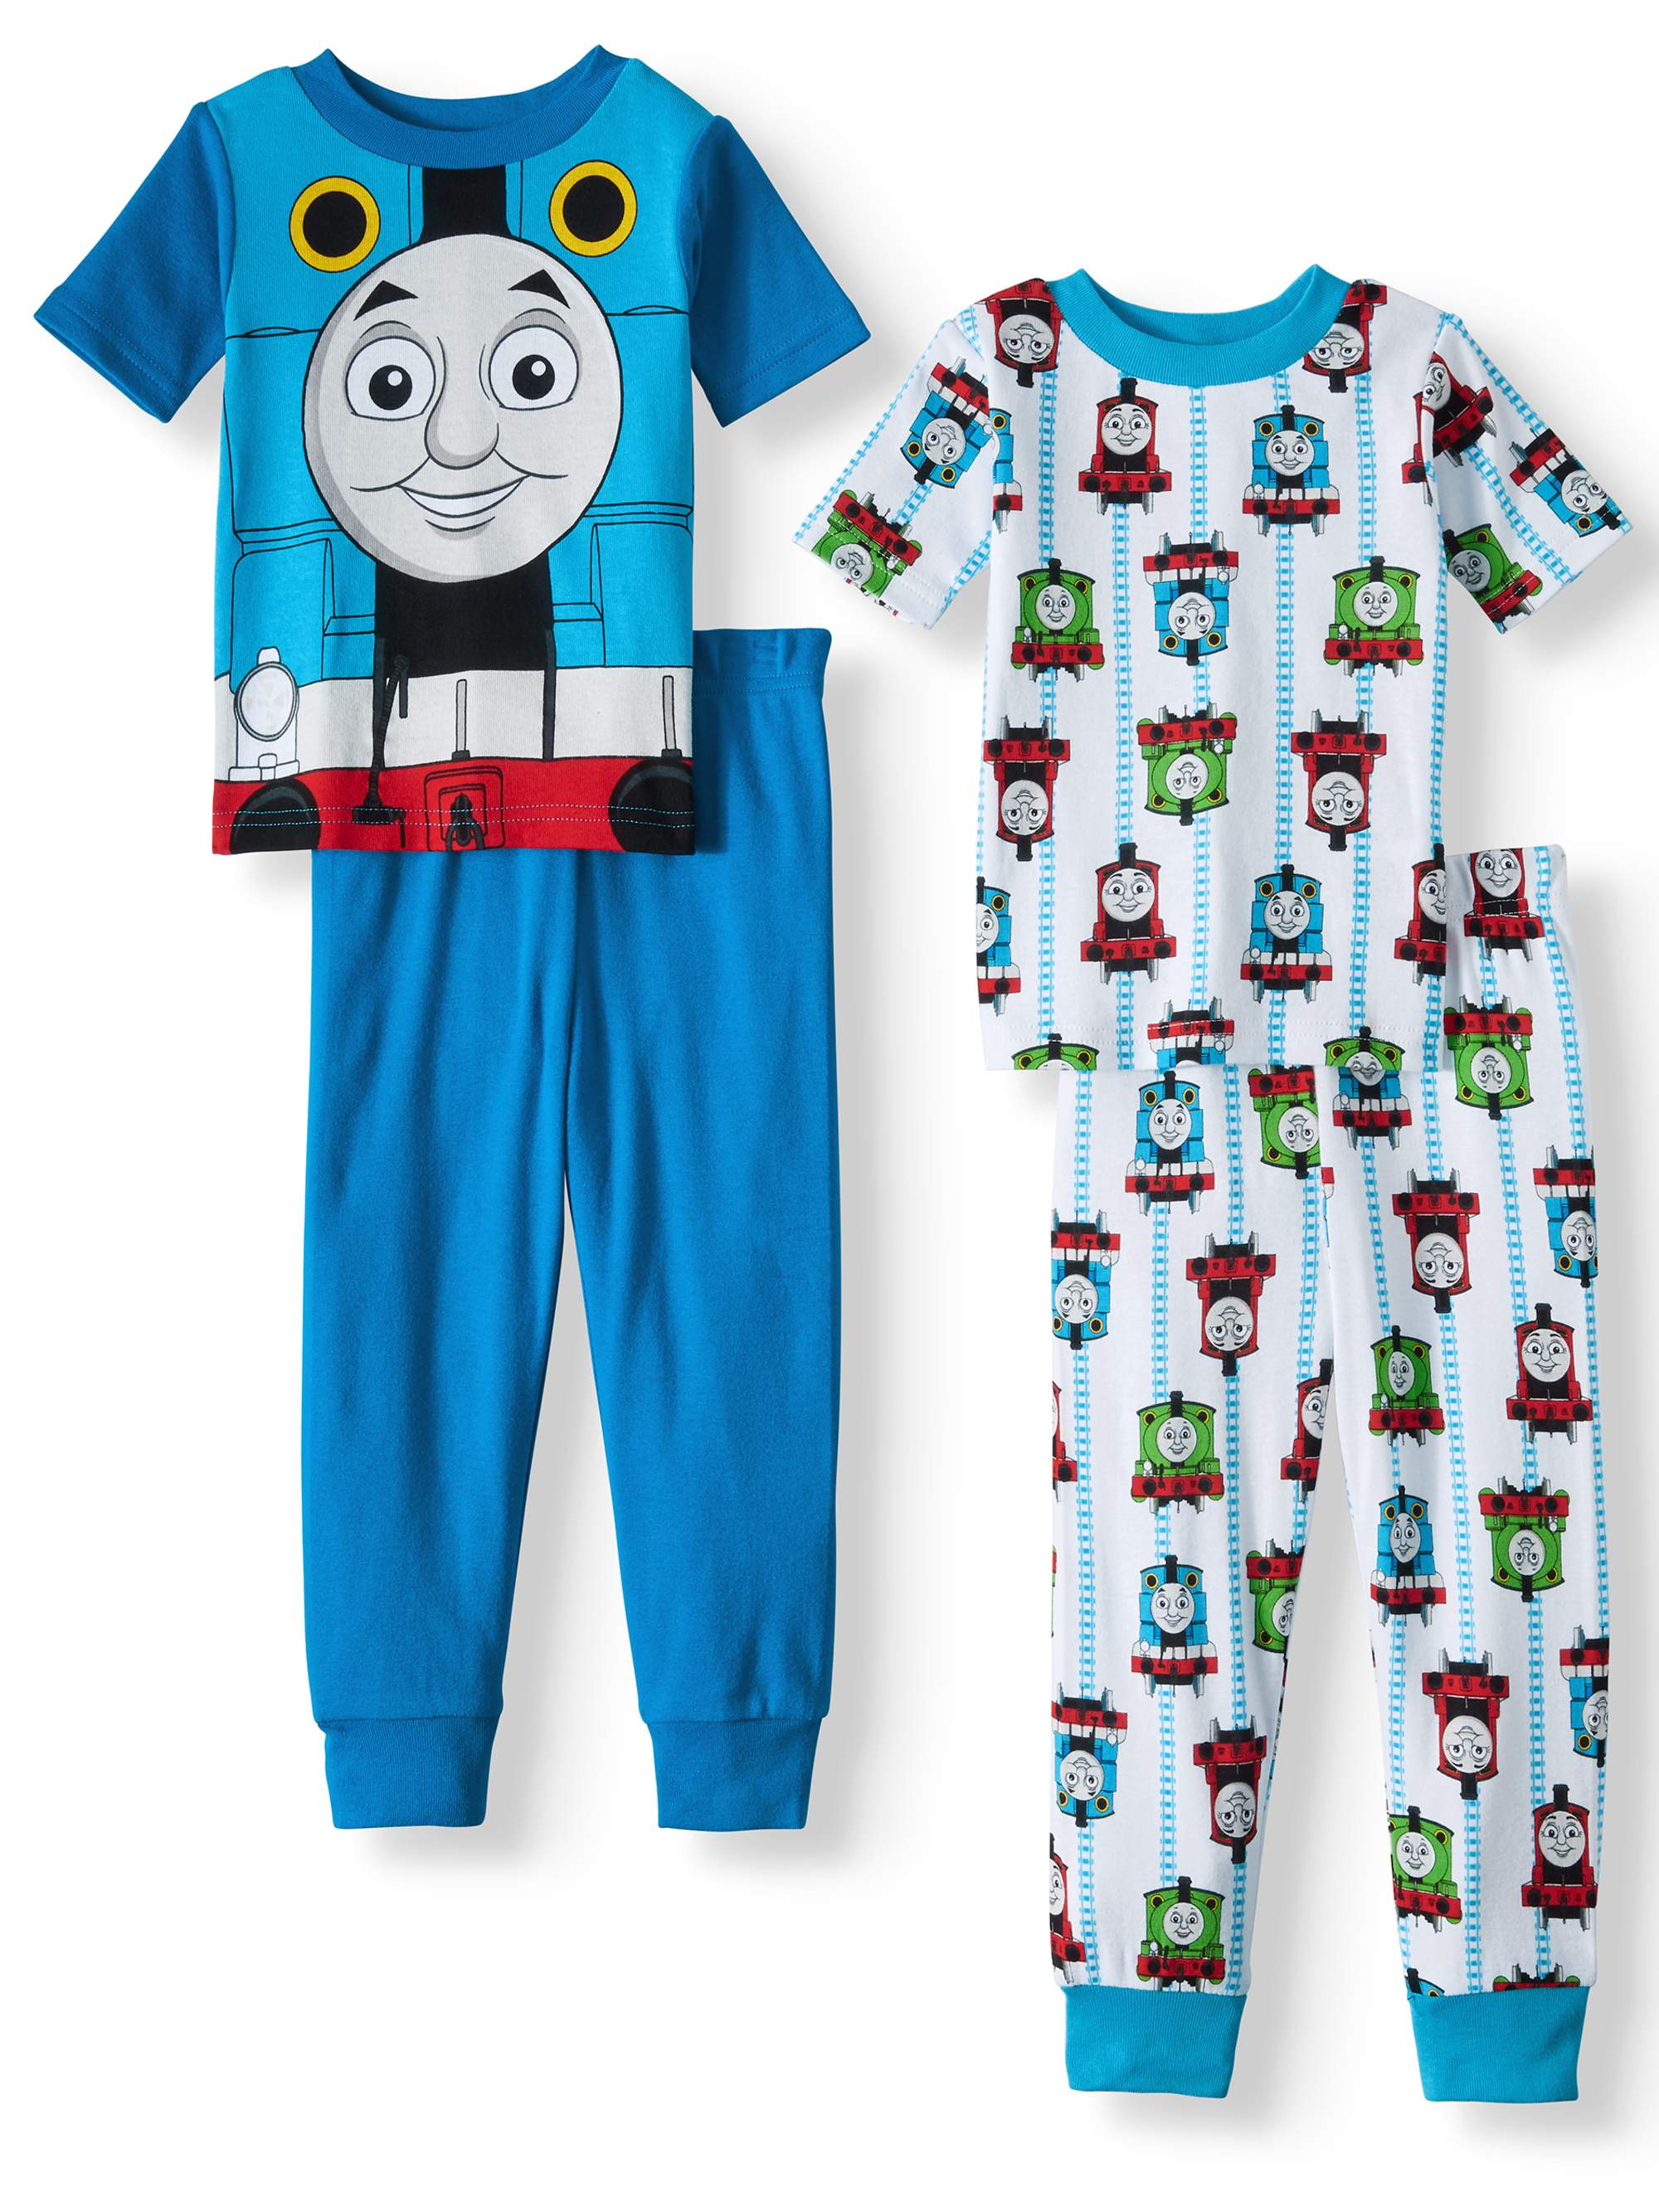 Toddler Boys' Cotton Tight Fit Pajamas, 4-Piece Set